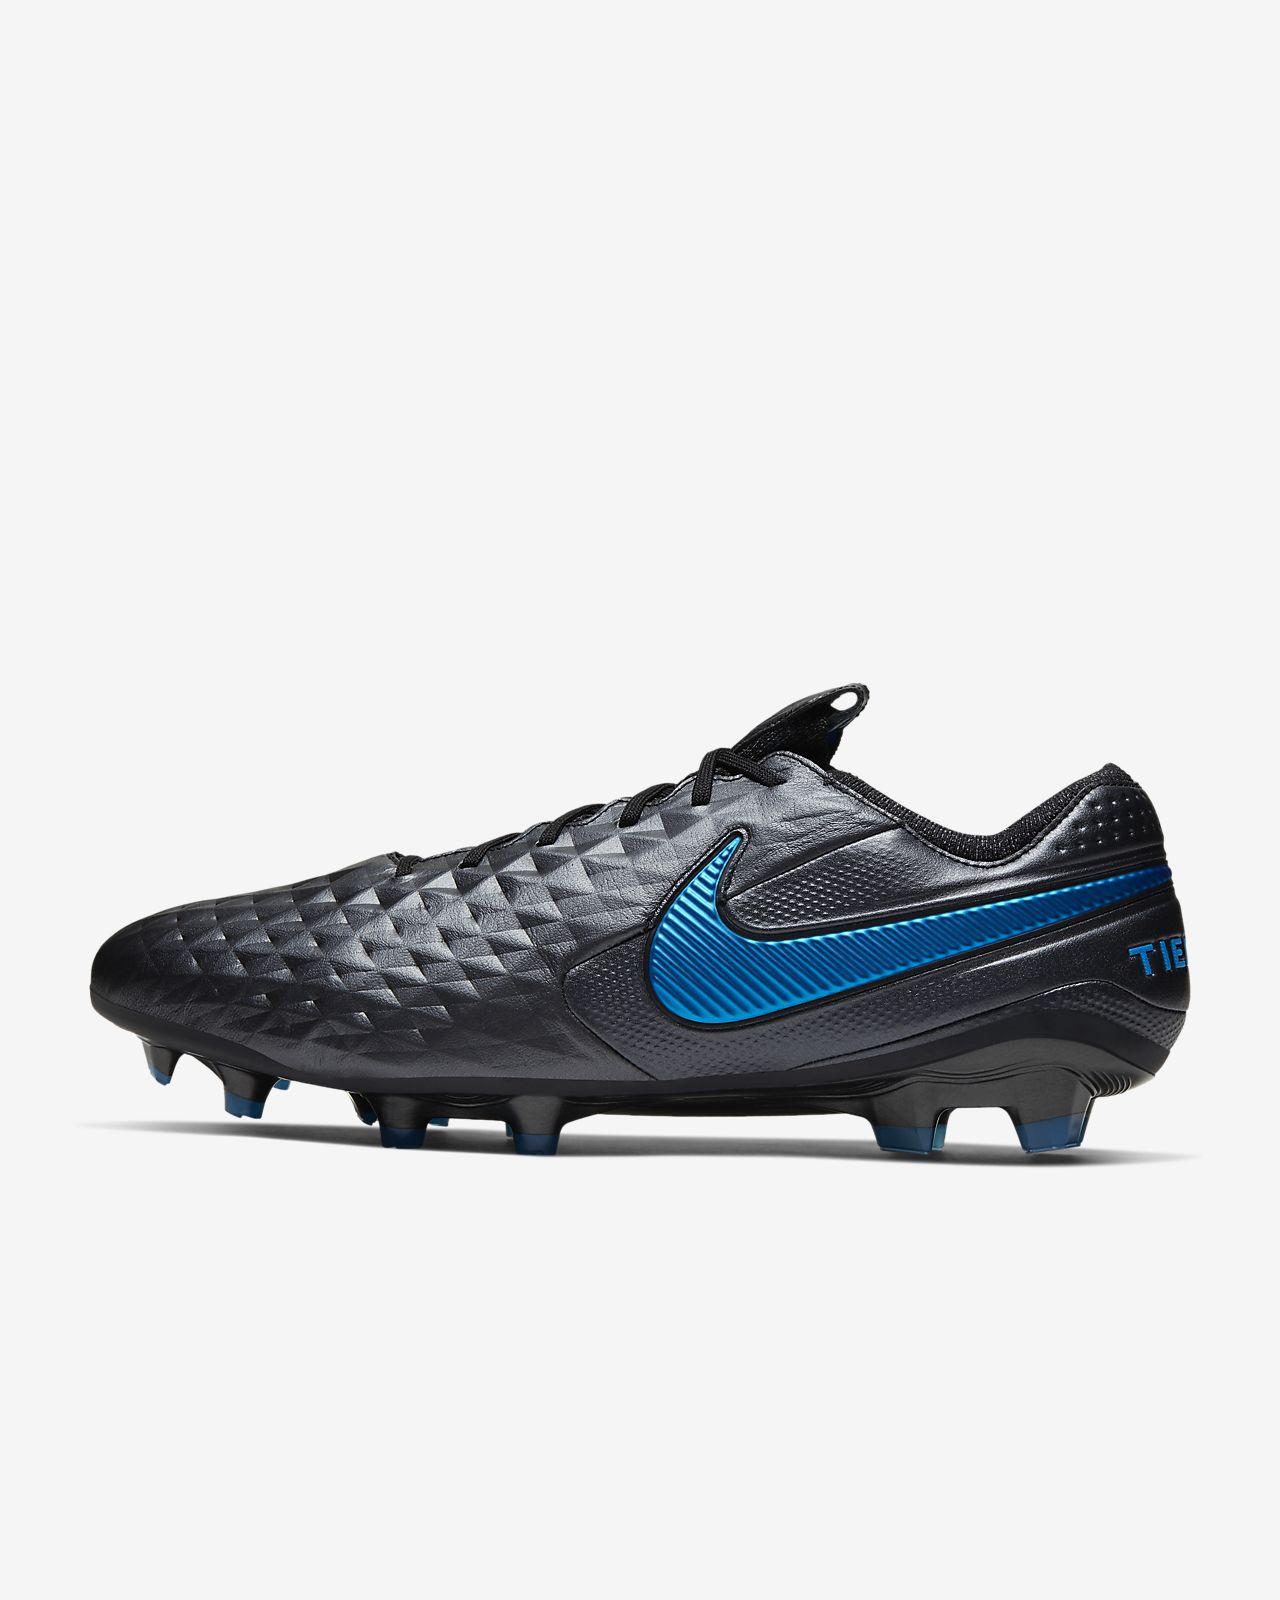 98462aac03462 ... Chuteiras de futebol para terreno firme Nike Tiempo Legend 8 Elite FG